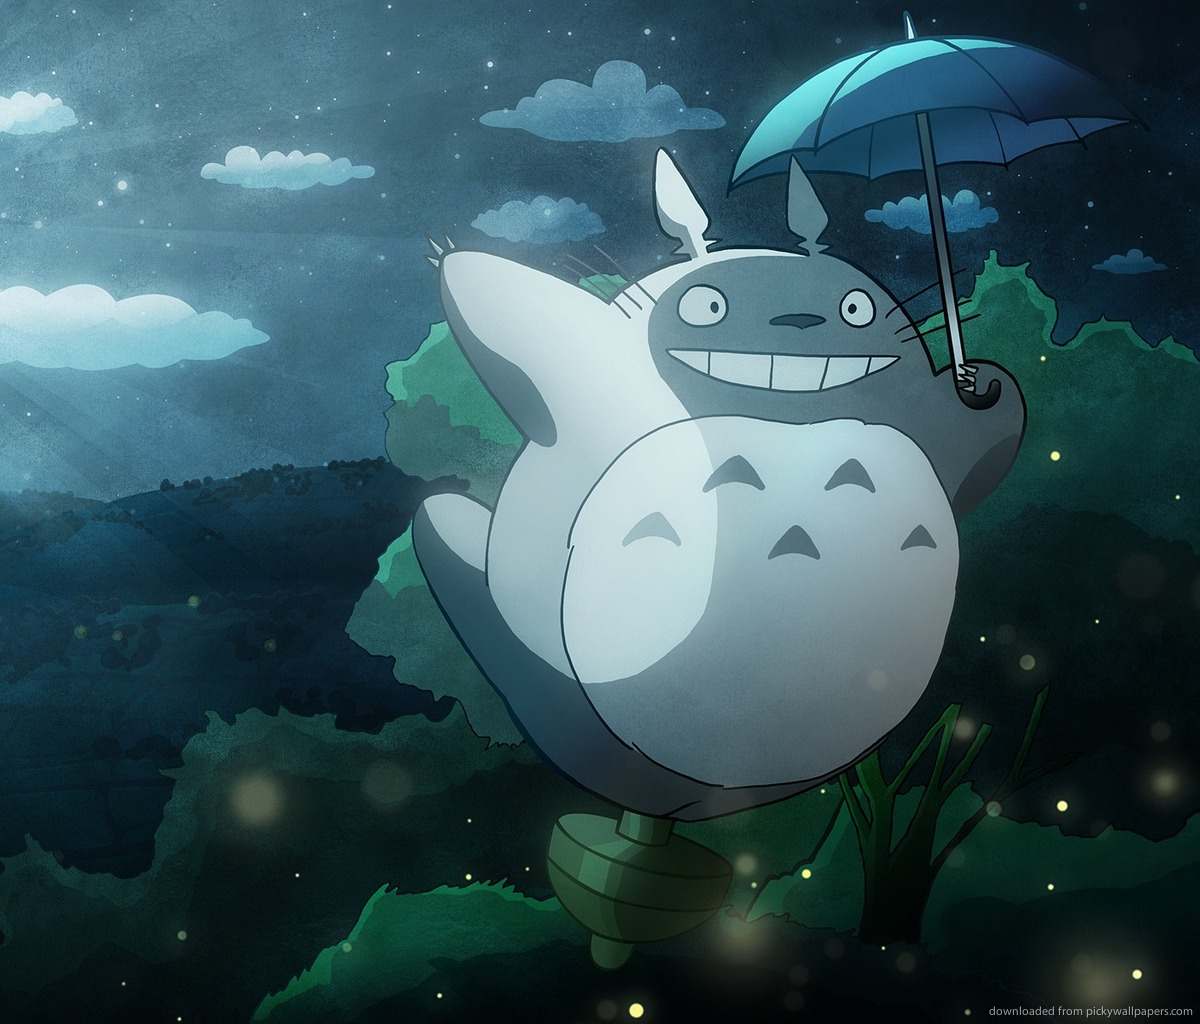 My Neighbor Totoro Wallpapers - WallpaperSafari